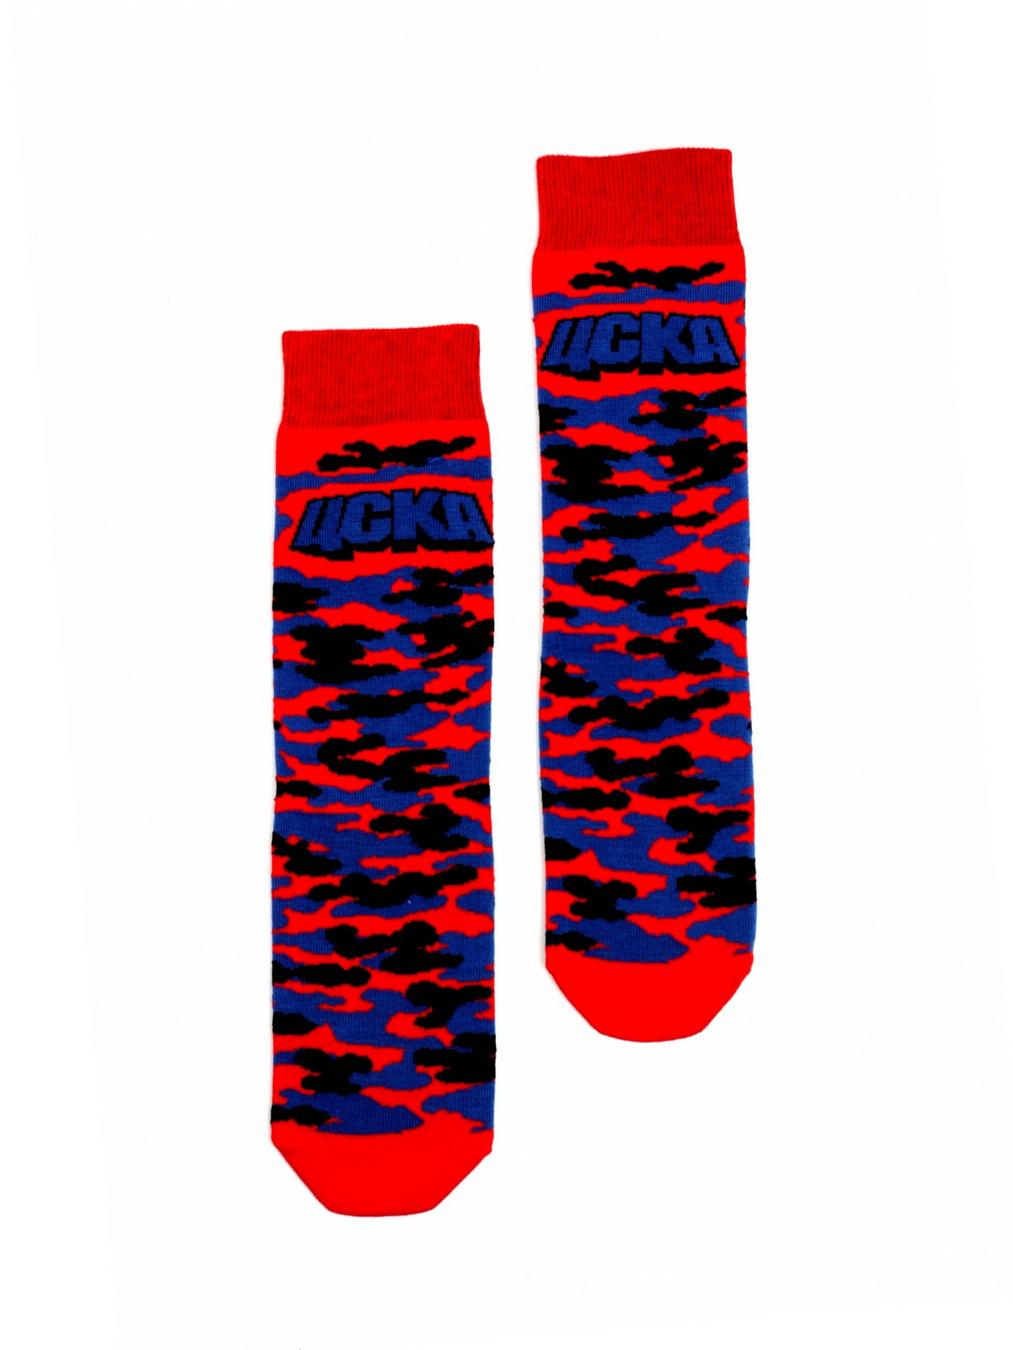 Носки детские Милитари,цвет красно-синий (35-36) фото